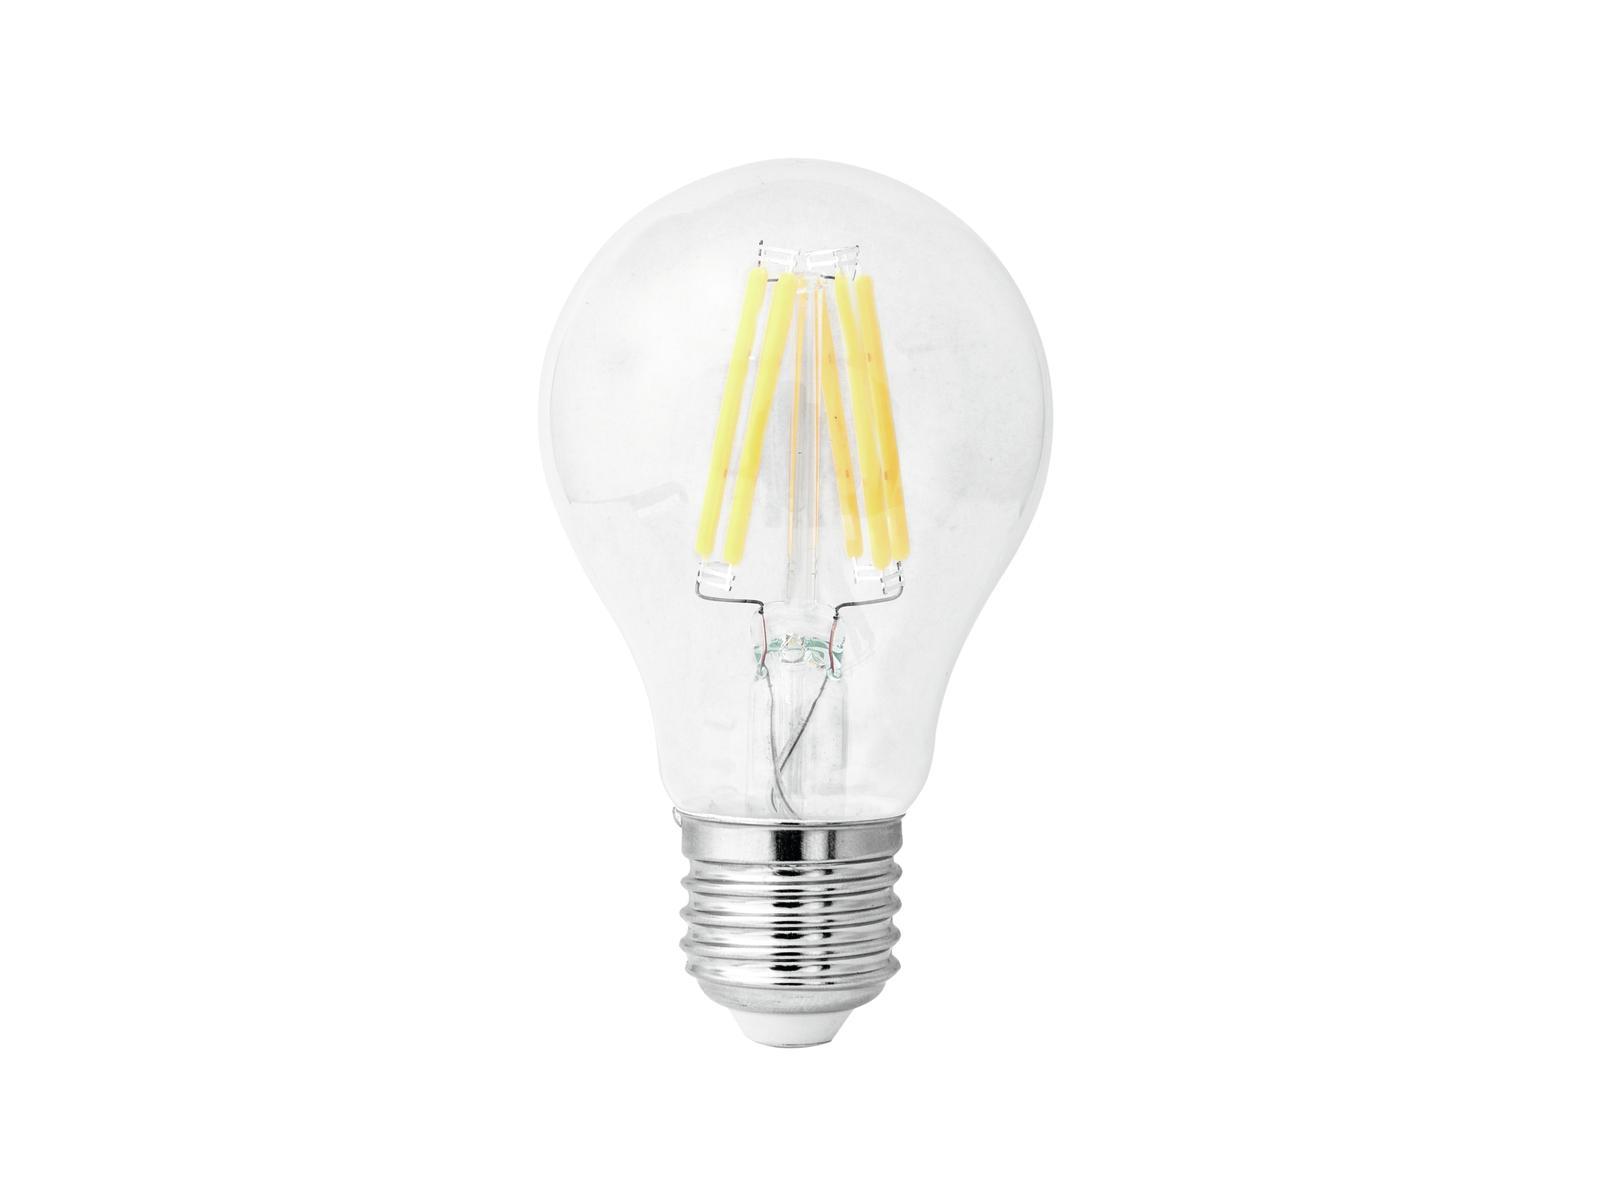 Lampada a led con filament A60 230V 4W E-27 3000K OMNILUX